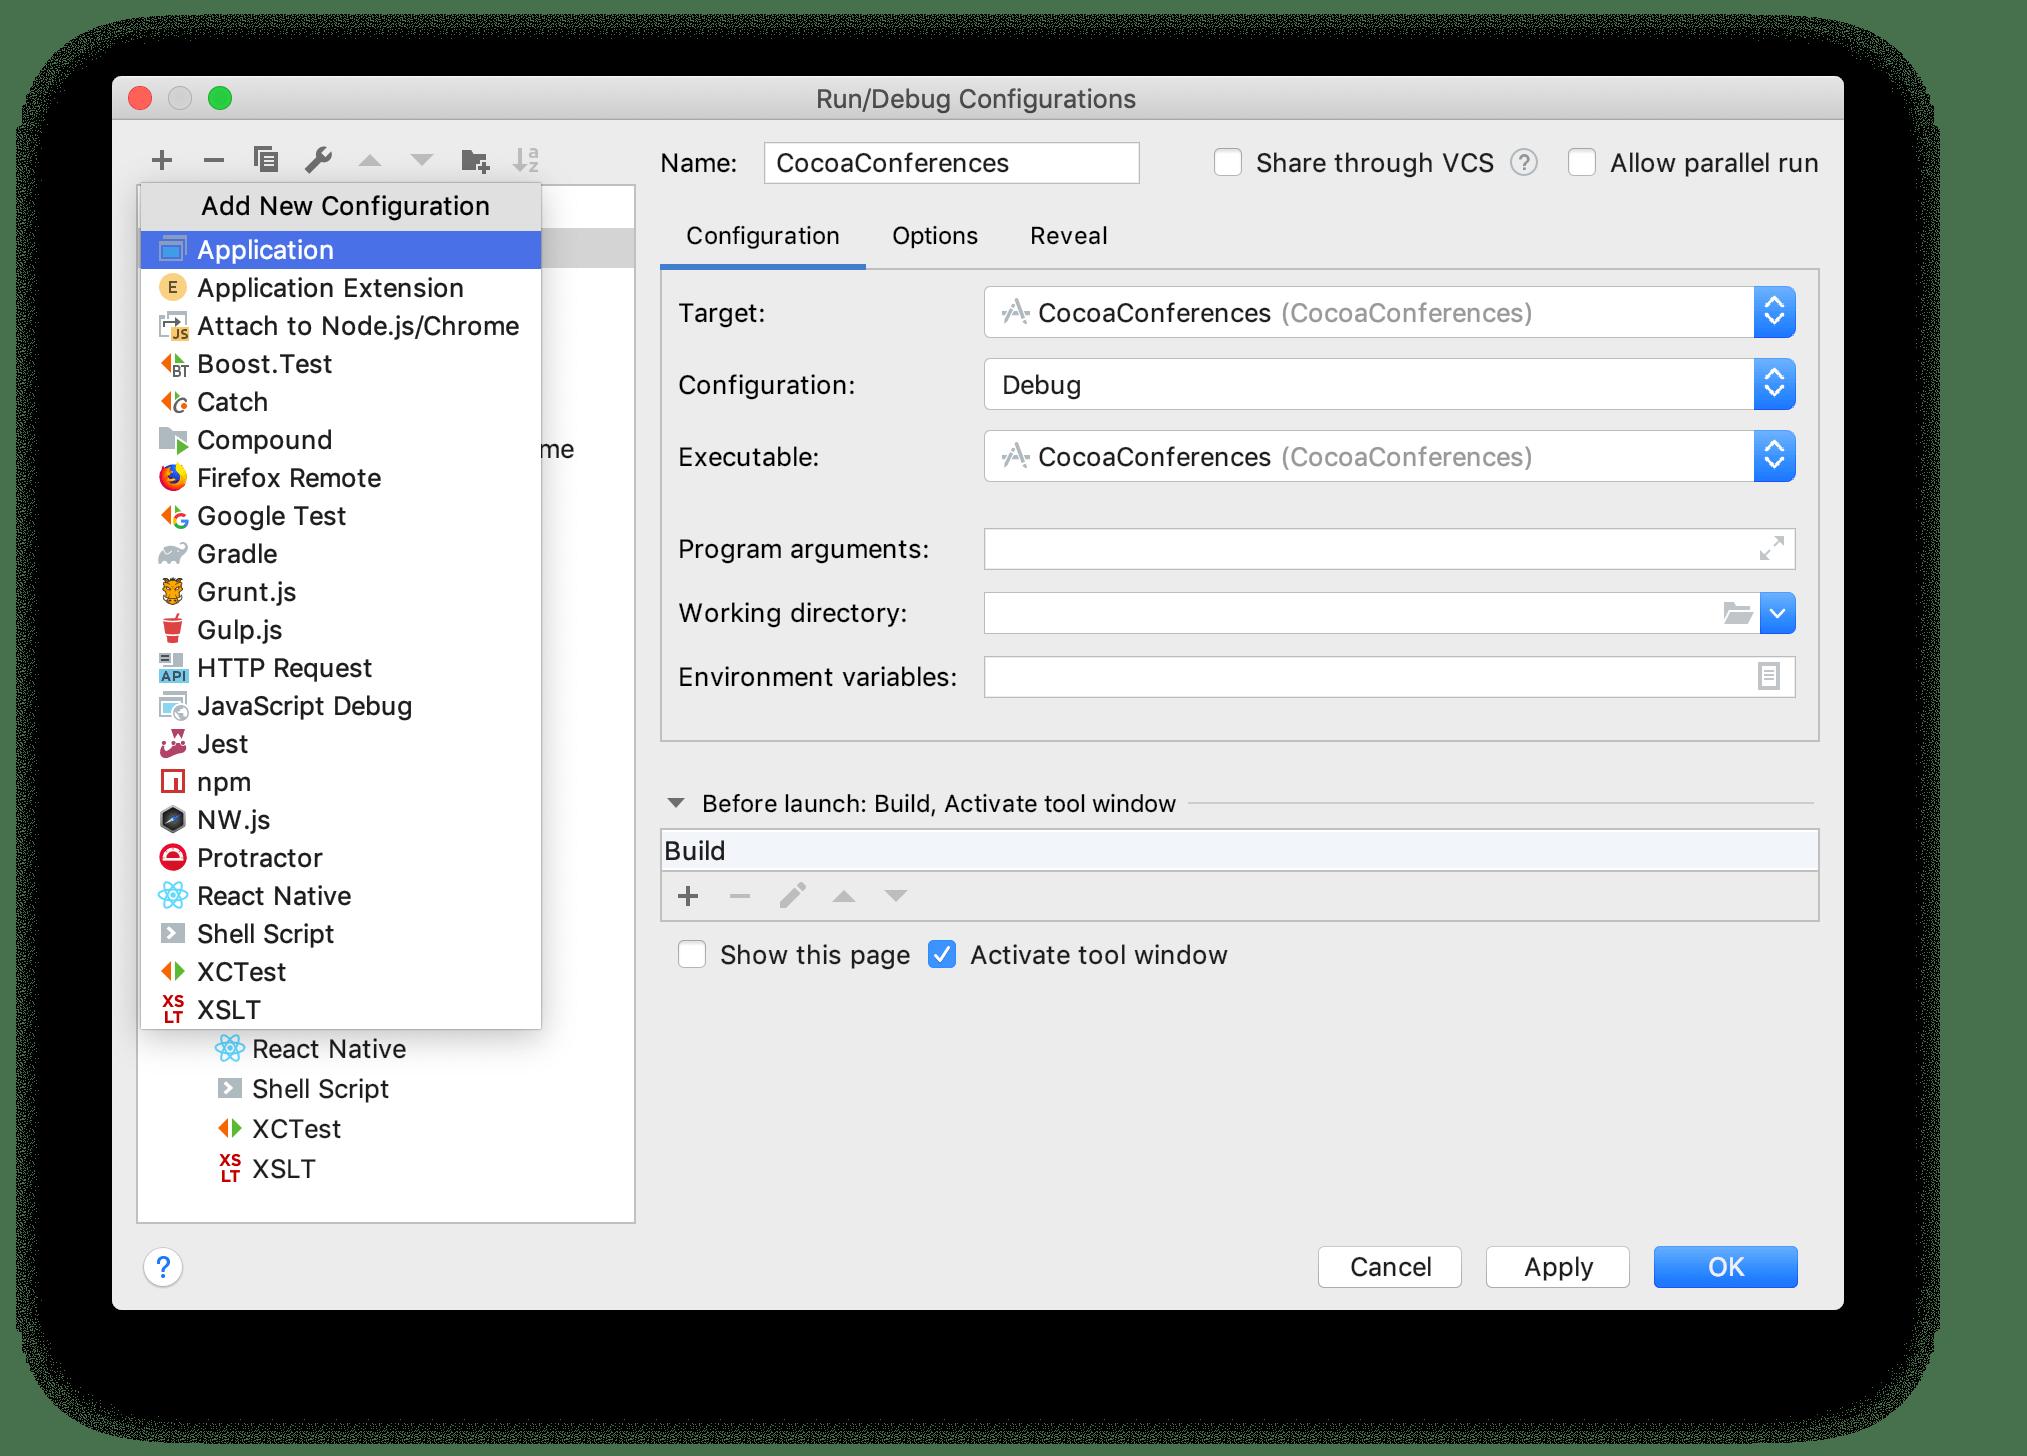 Add a new run/debug configuration